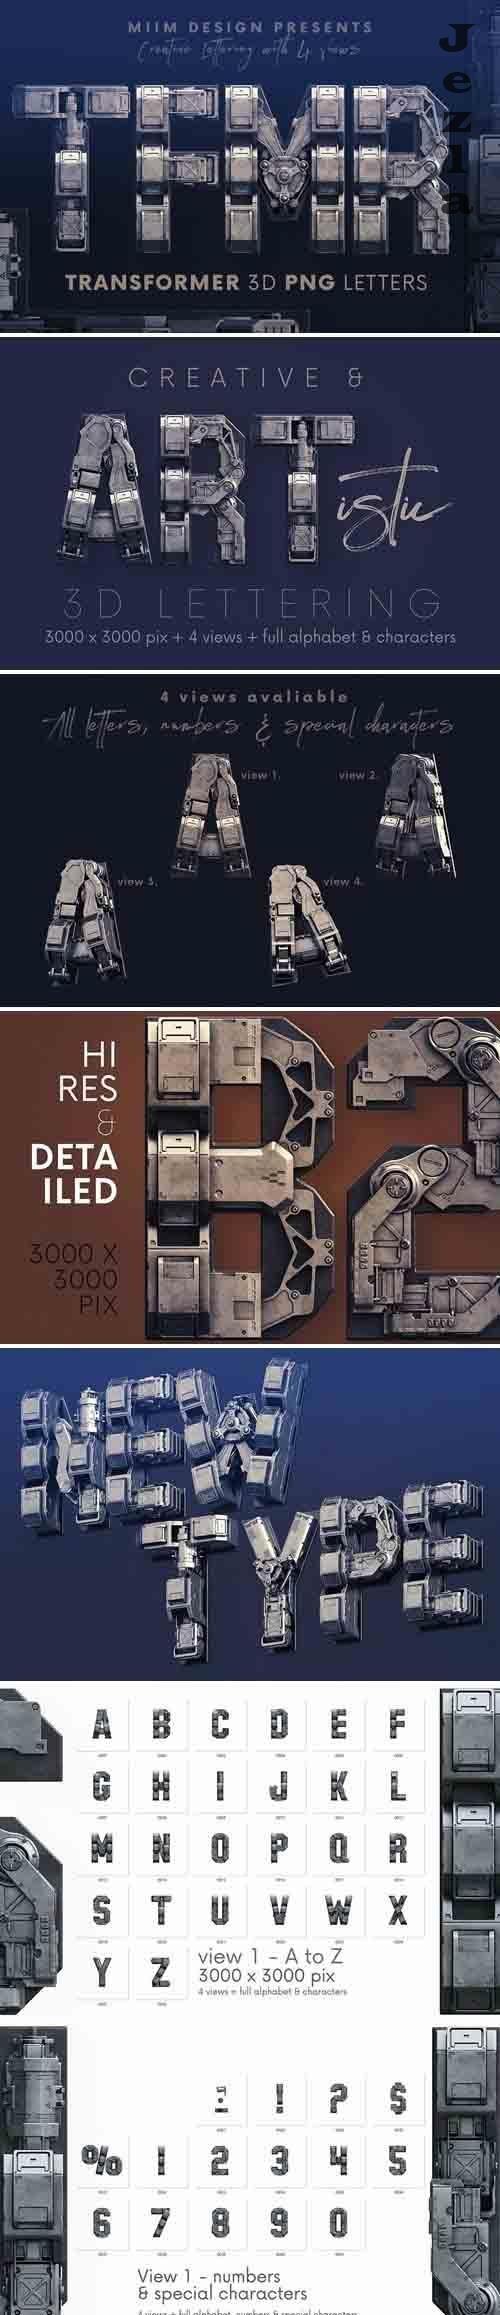 Transformer - 3D Lettering - 6129568